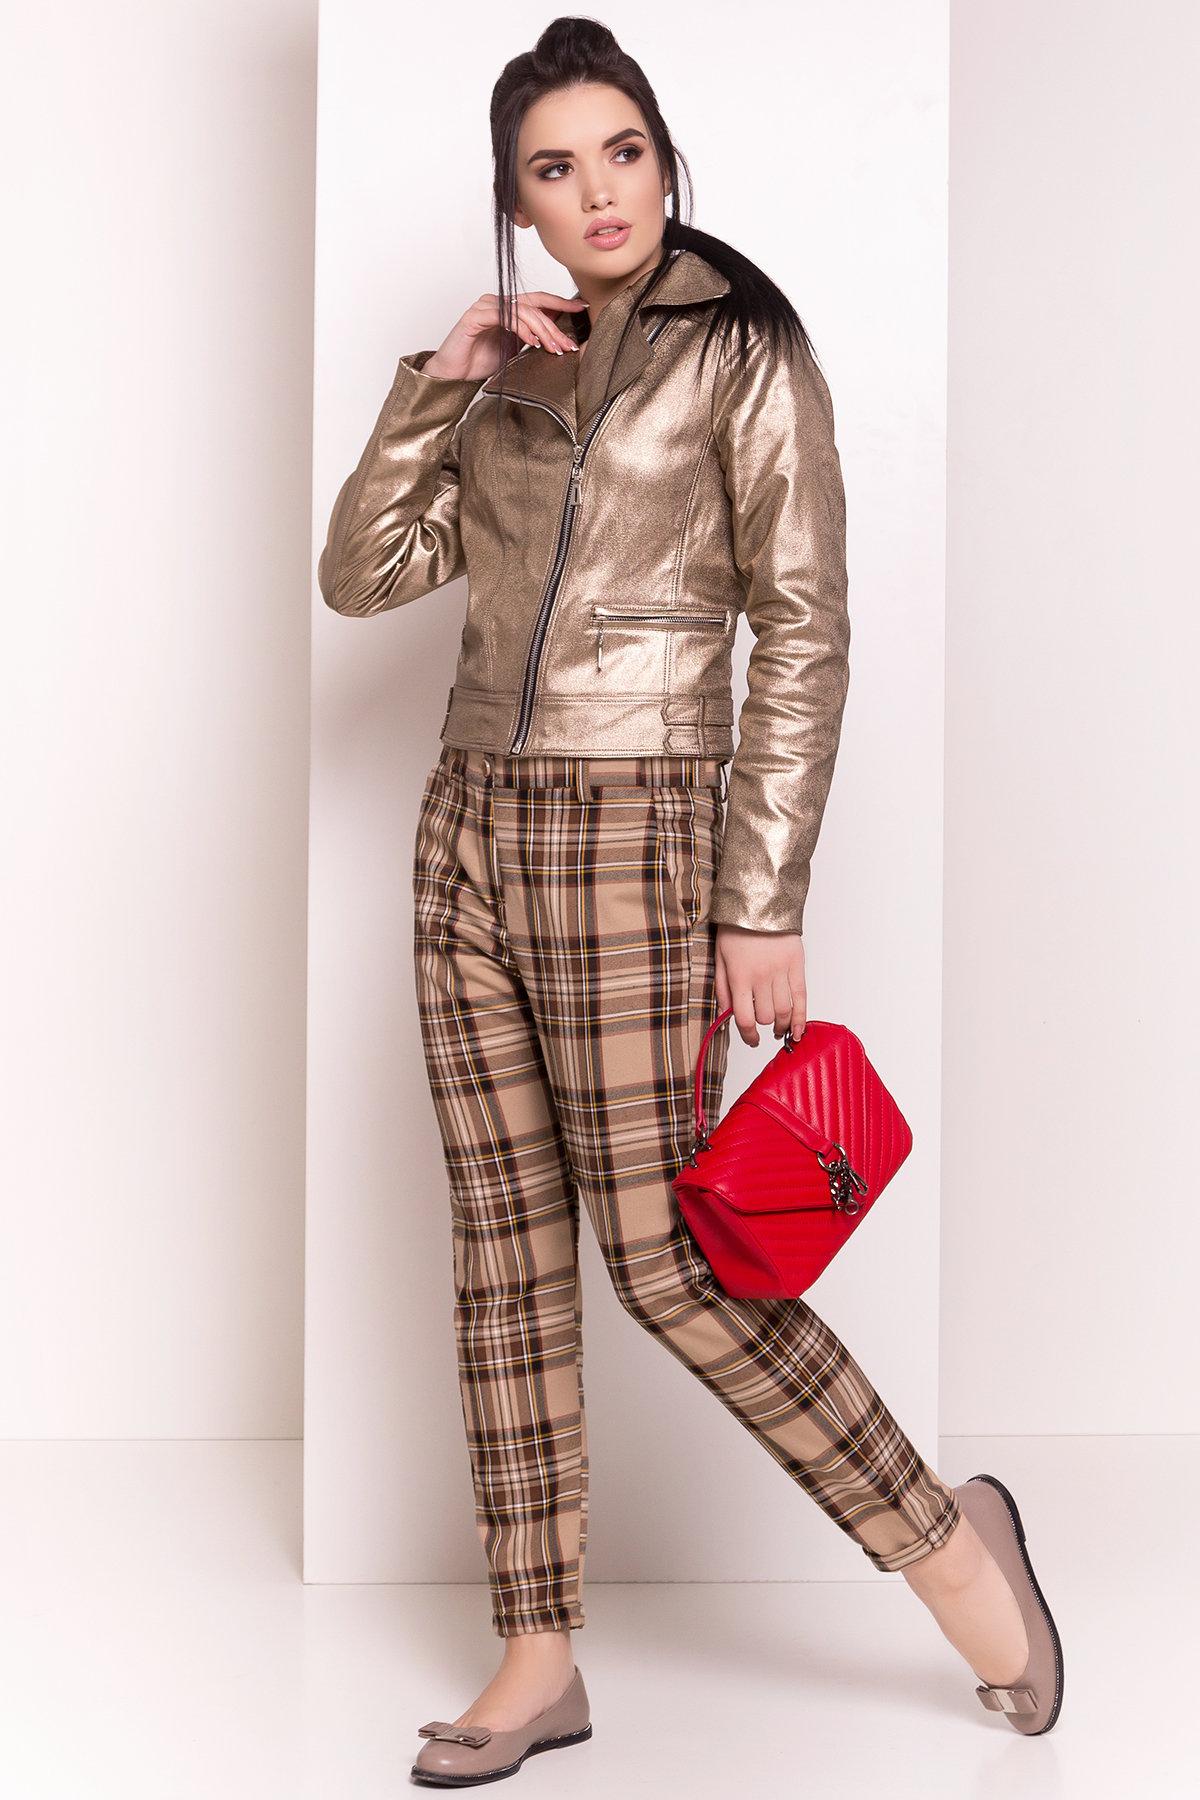 Жакет Байкер 4669 АРТ. 34559 Цвет: Золото - фото 2, интернет магазин tm-modus.ru